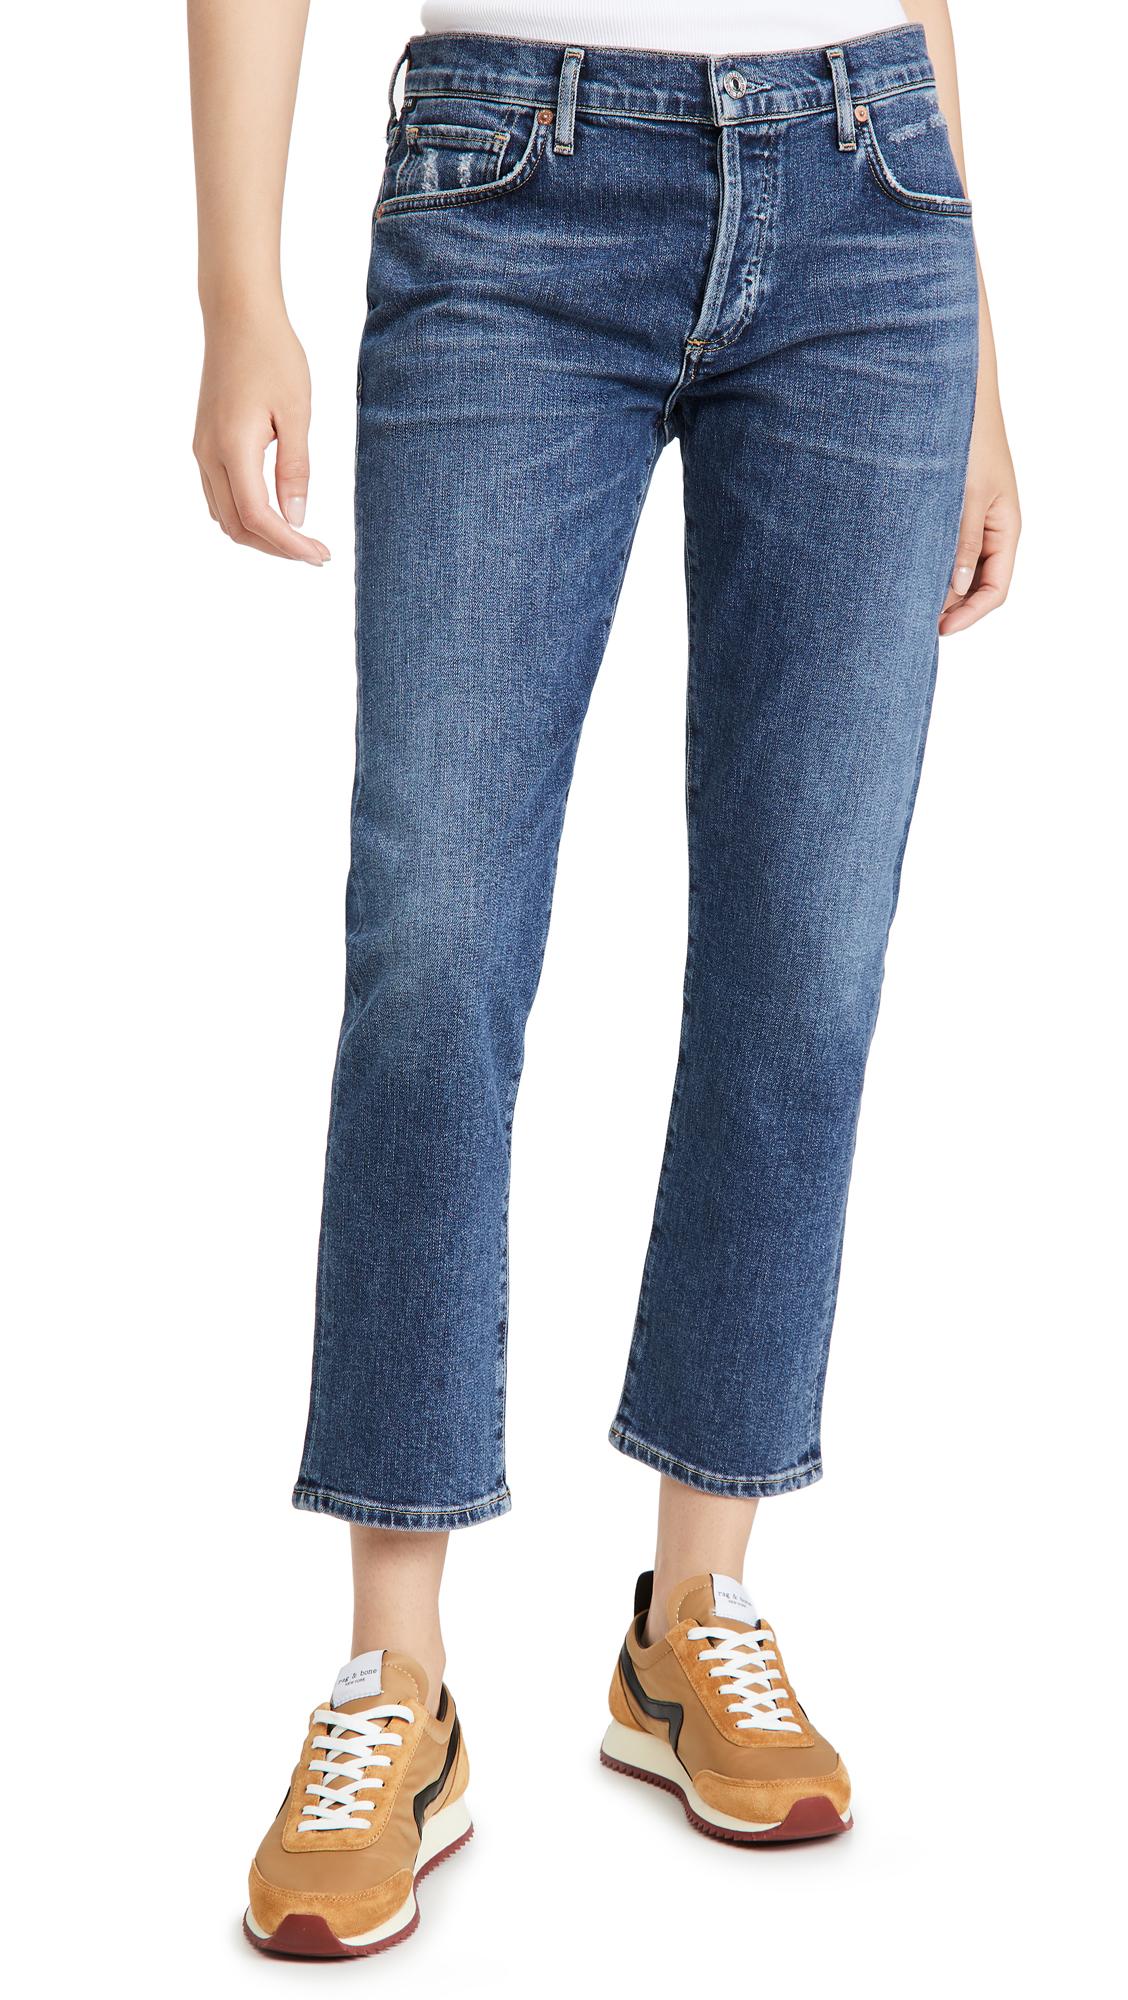 Citizens of Humanity Emerson Slim Boyfriend Distressed Jeans